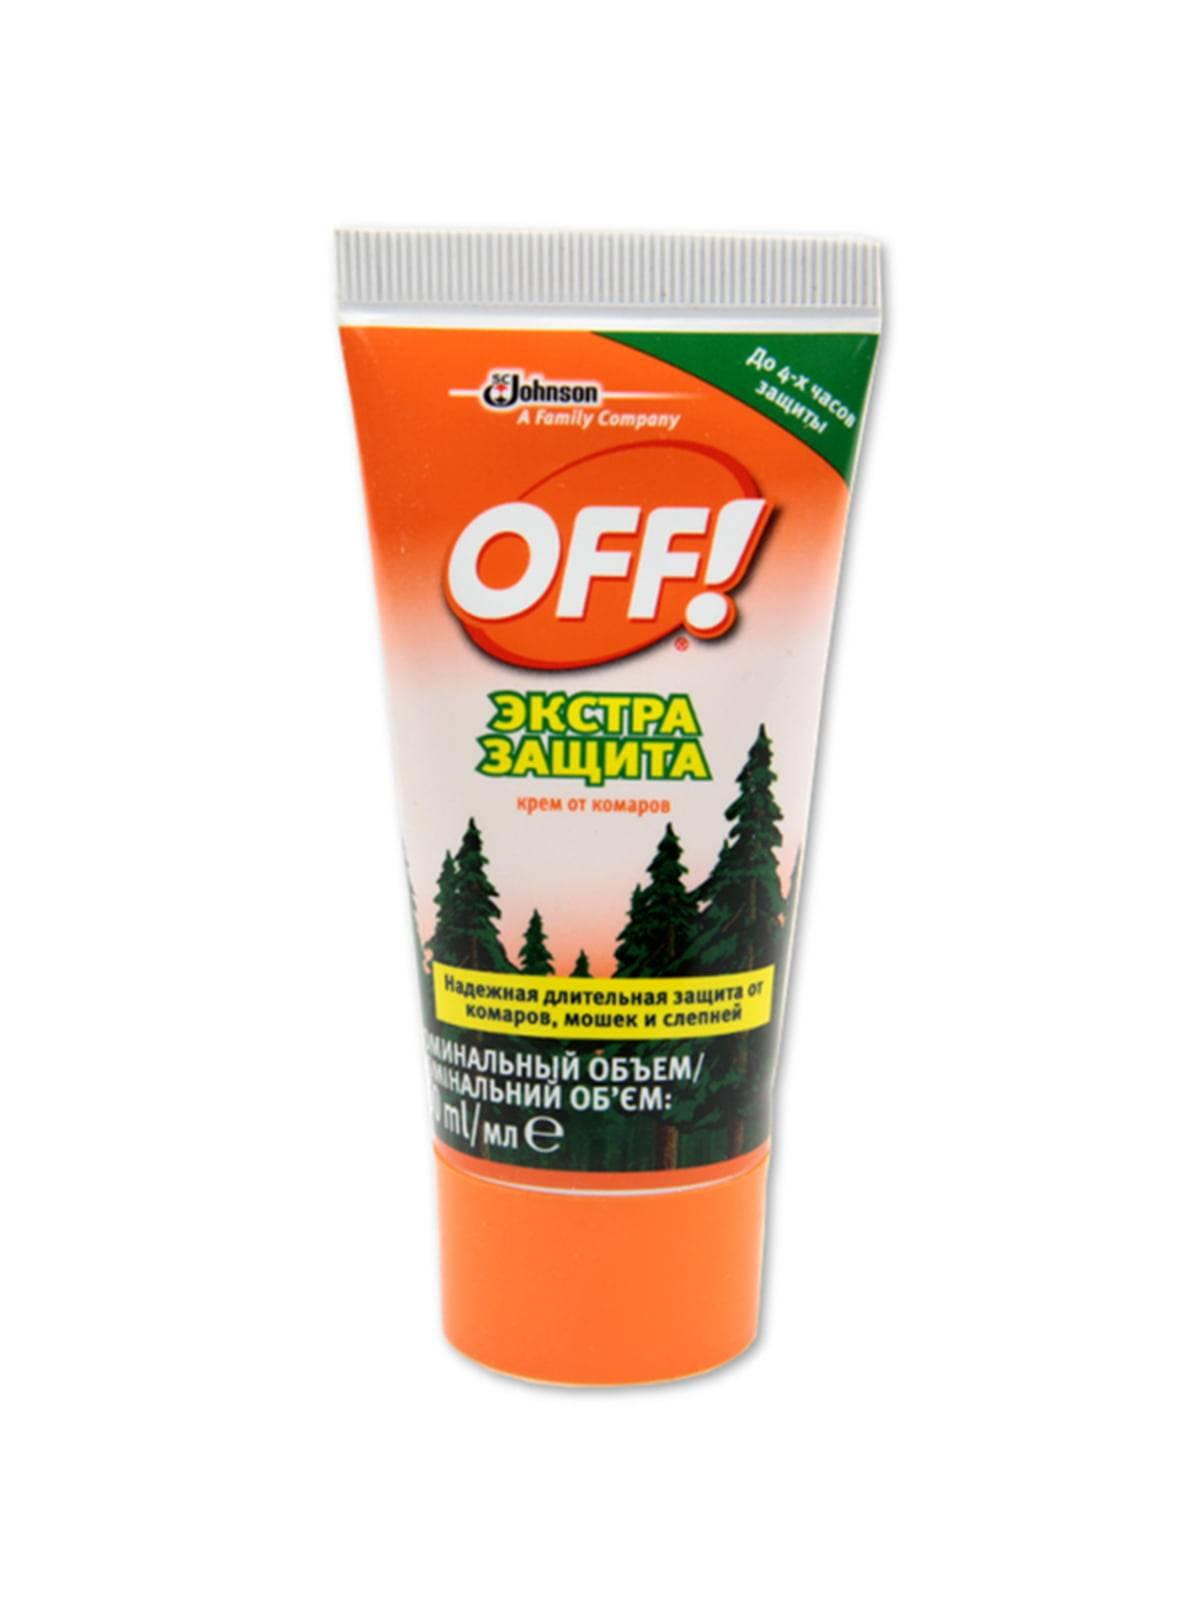 Off! (офф) clip-on сменный картридж и прибор на батарейках с фен-системой, 1 шт